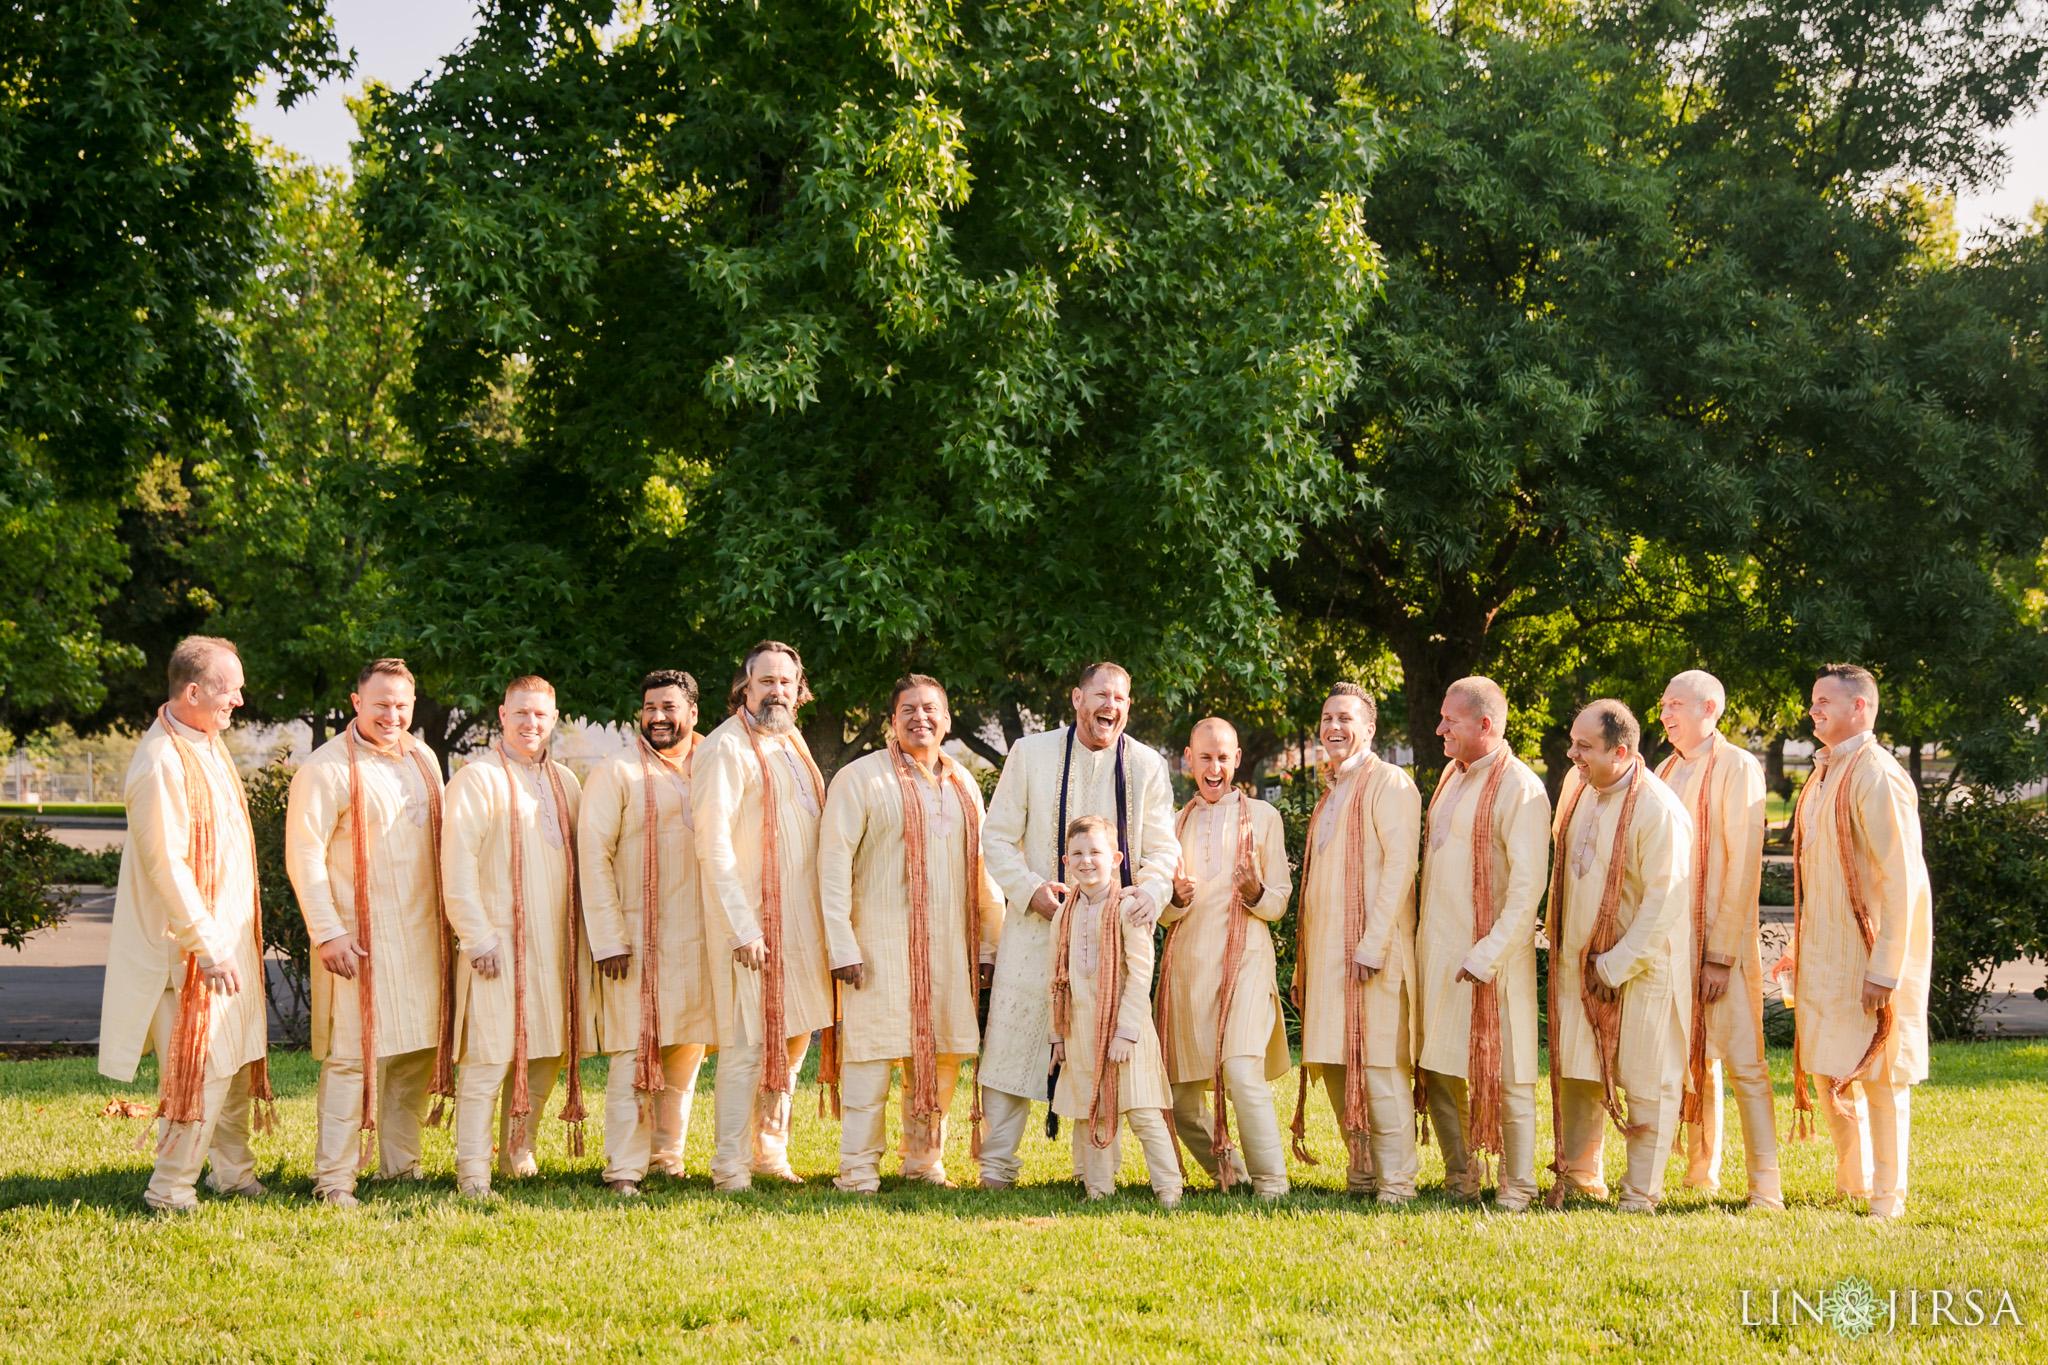 009 sherwood country club indian groomsmen wedding photography